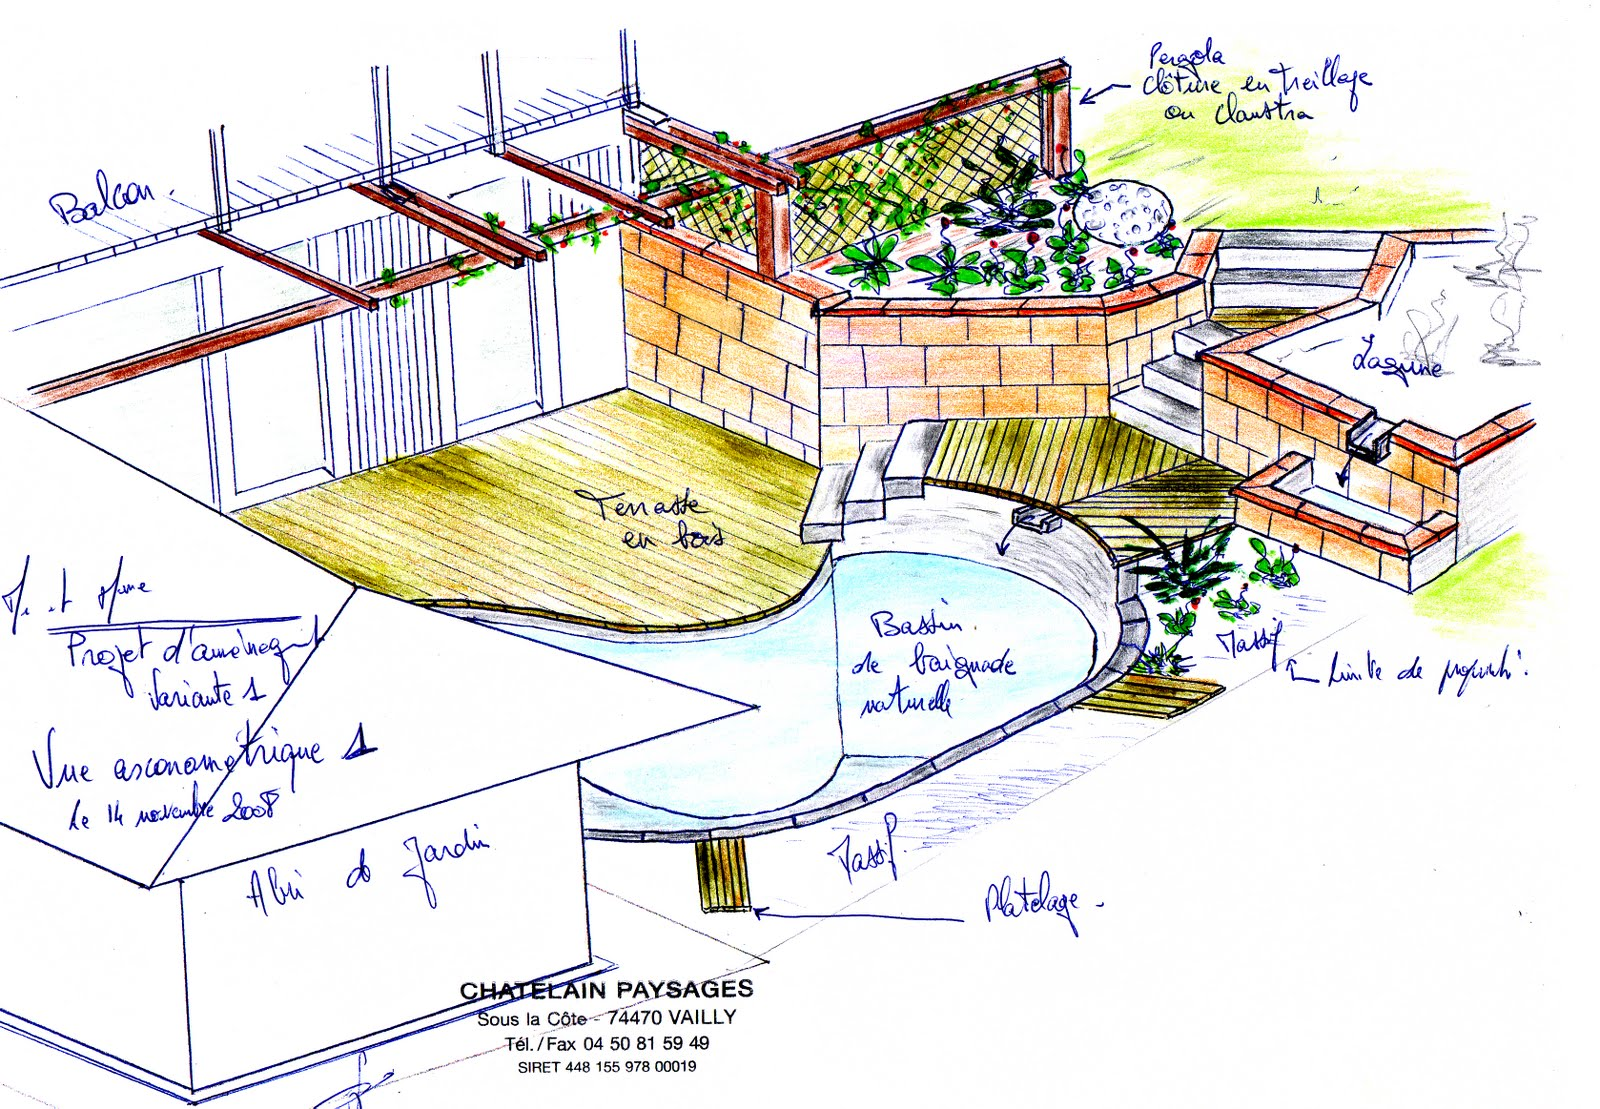 paysagiste et am nagement de jardin thonon et annemasse. Black Bedroom Furniture Sets. Home Design Ideas